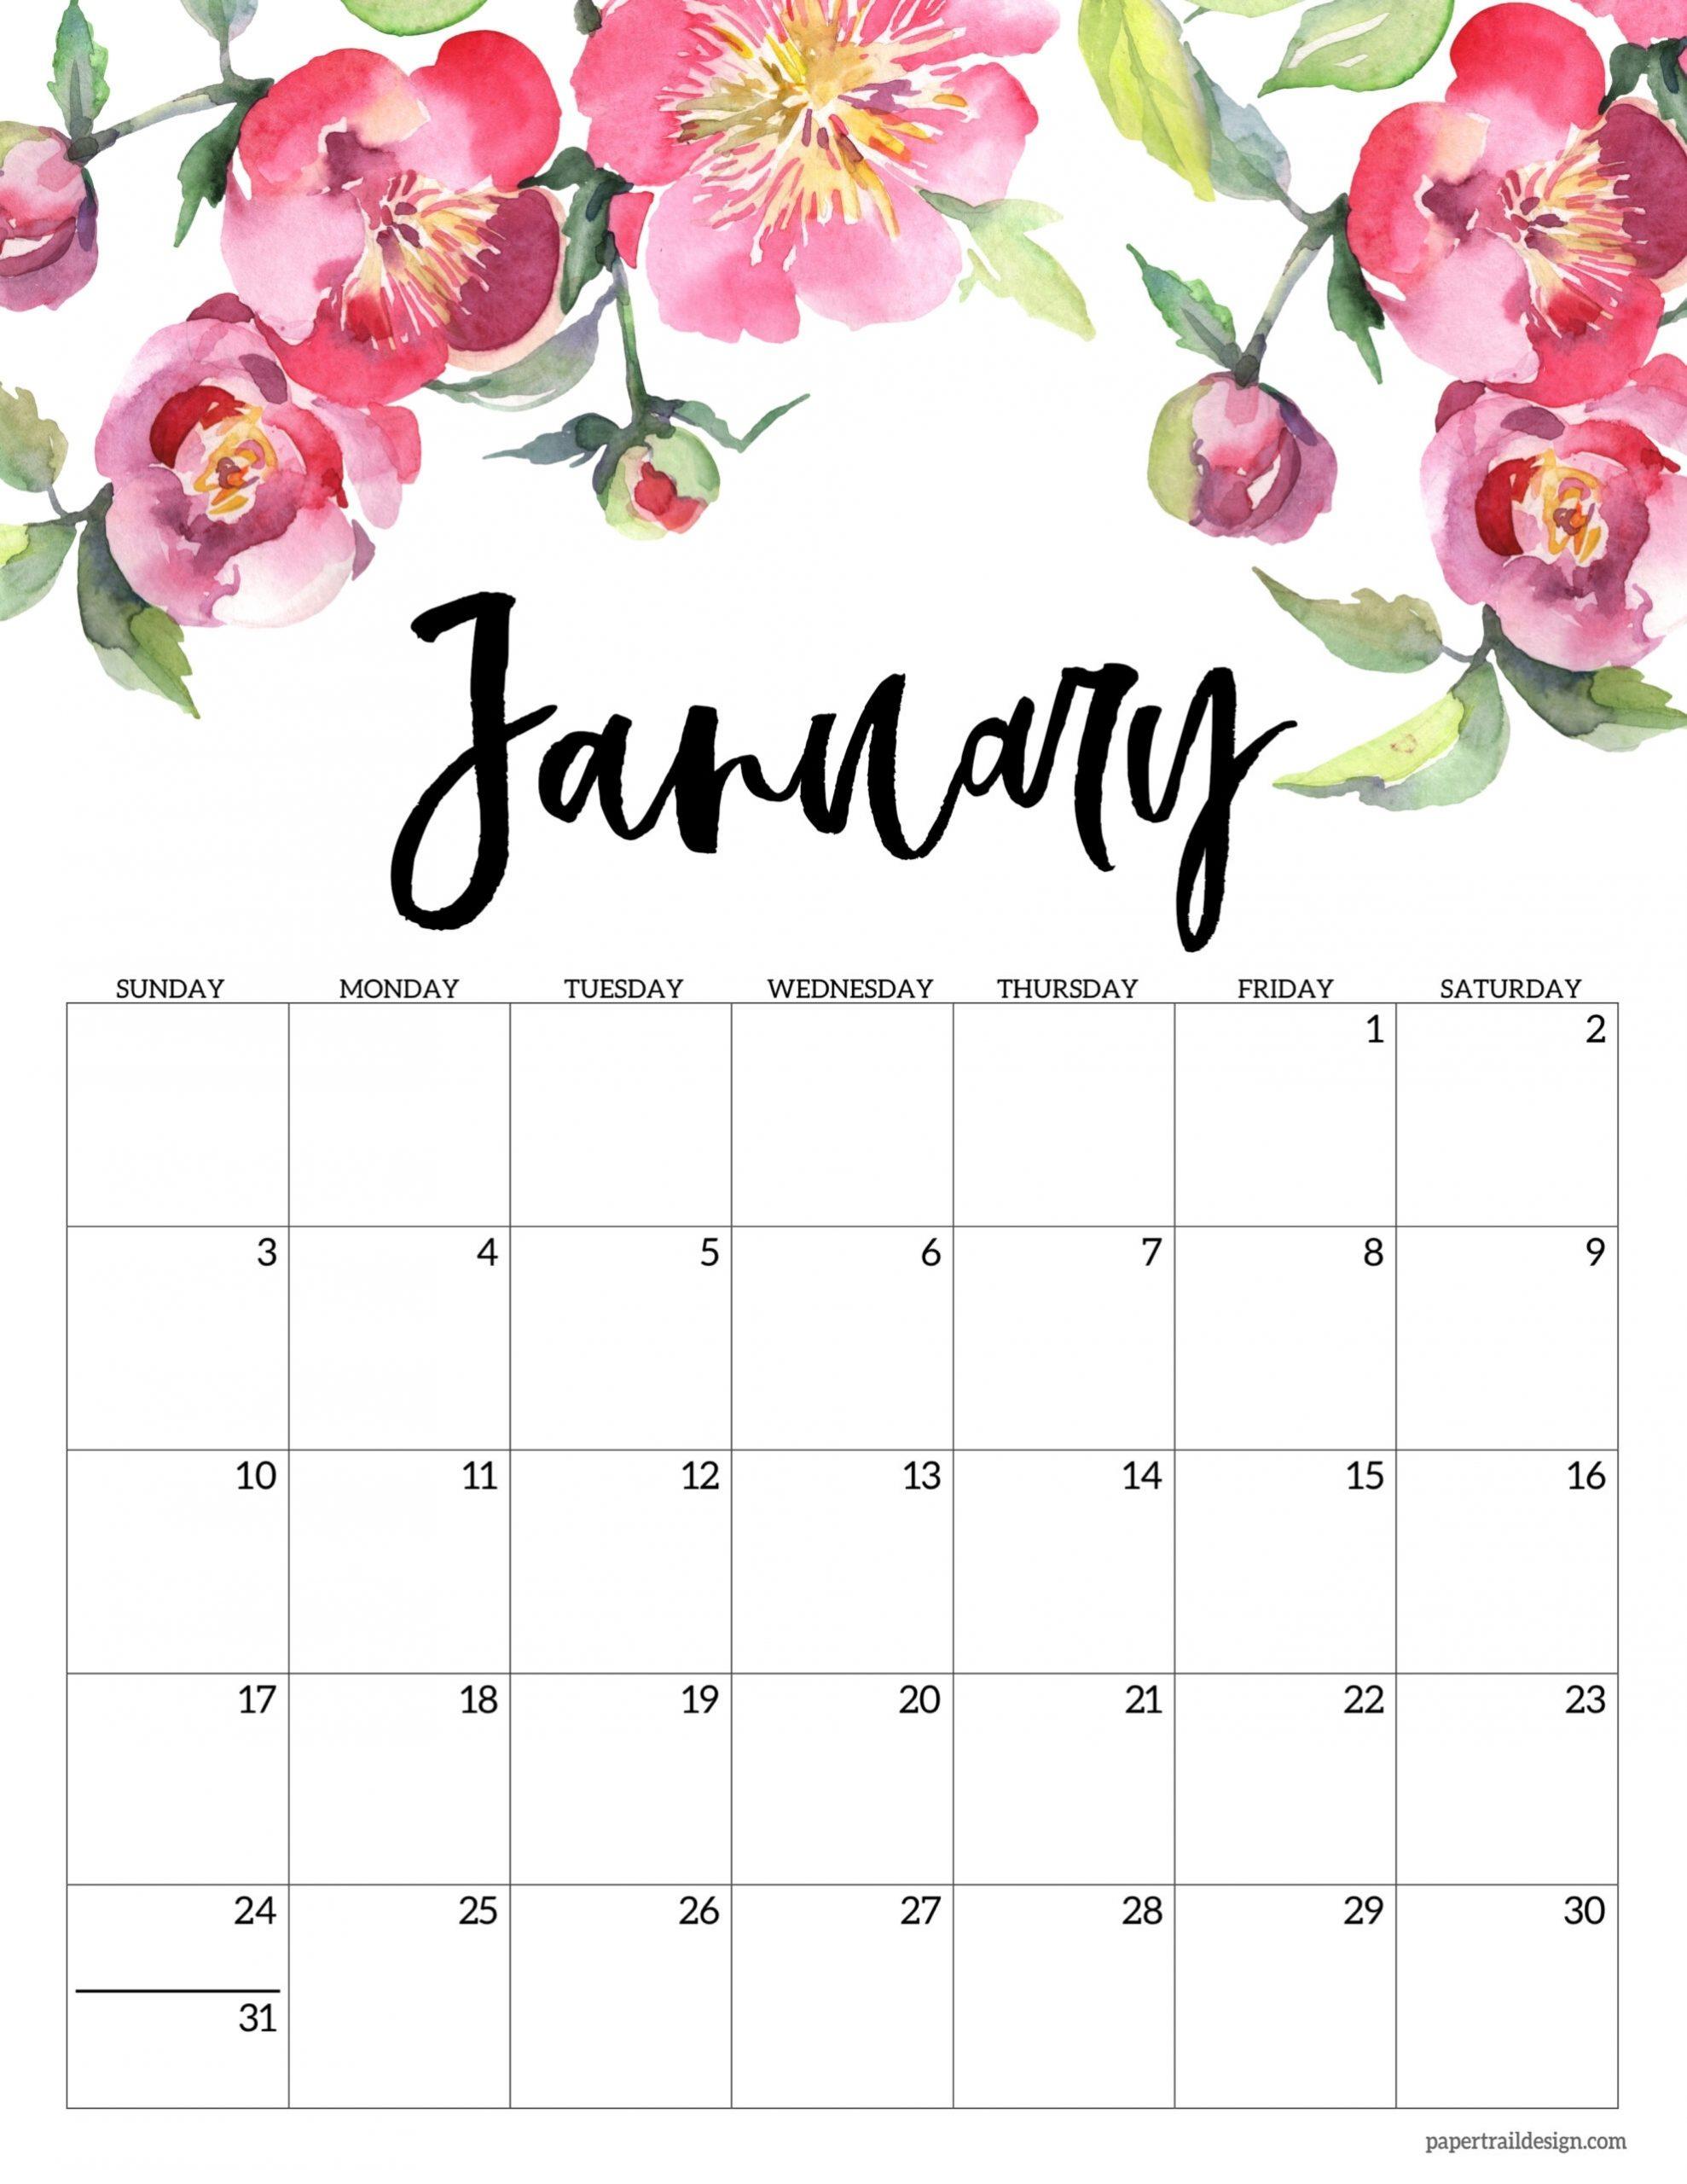 Take Free Printable Floral Calendar 2021